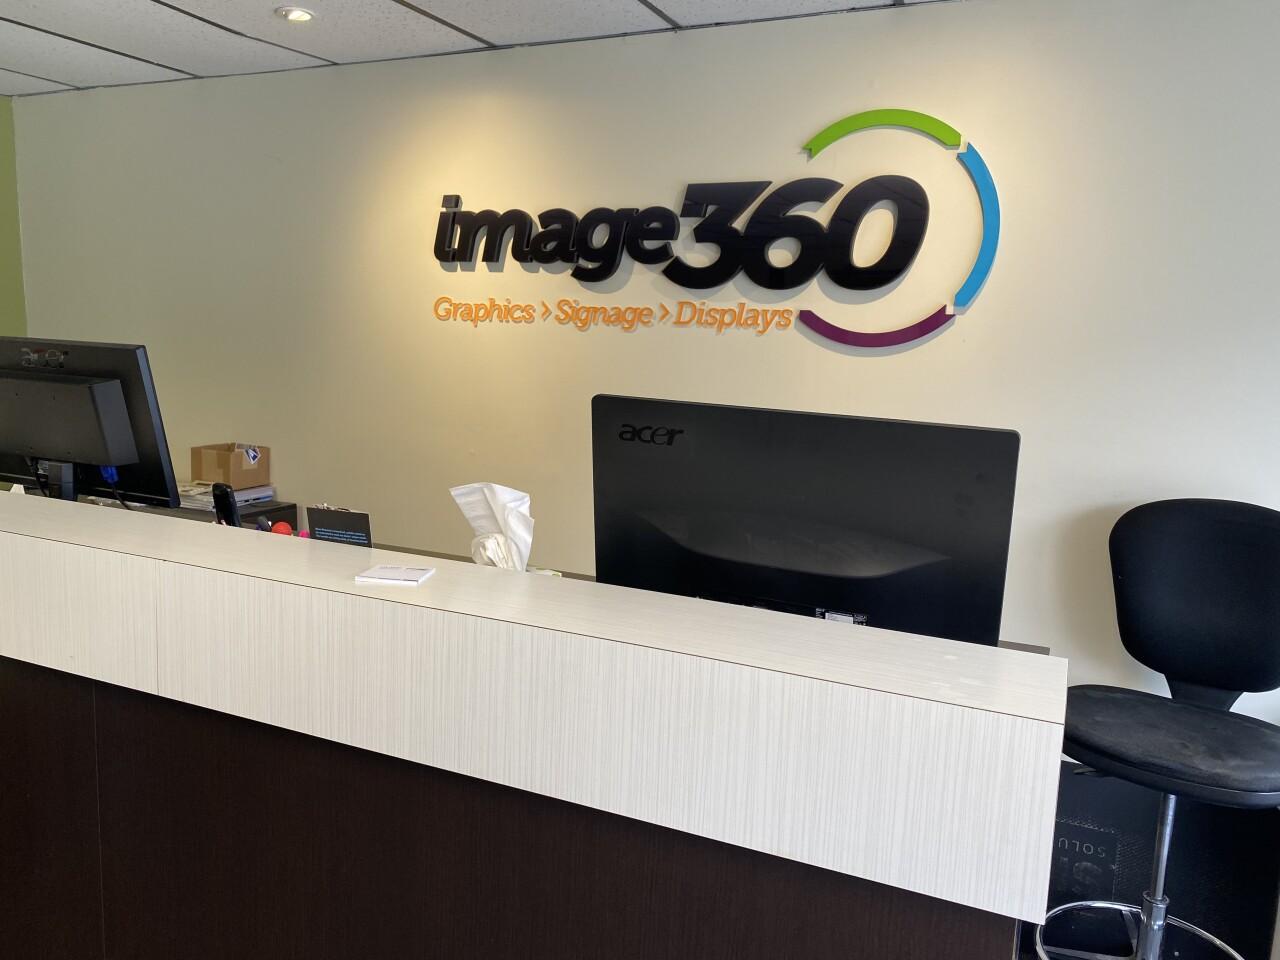 Image 360 3.jpg